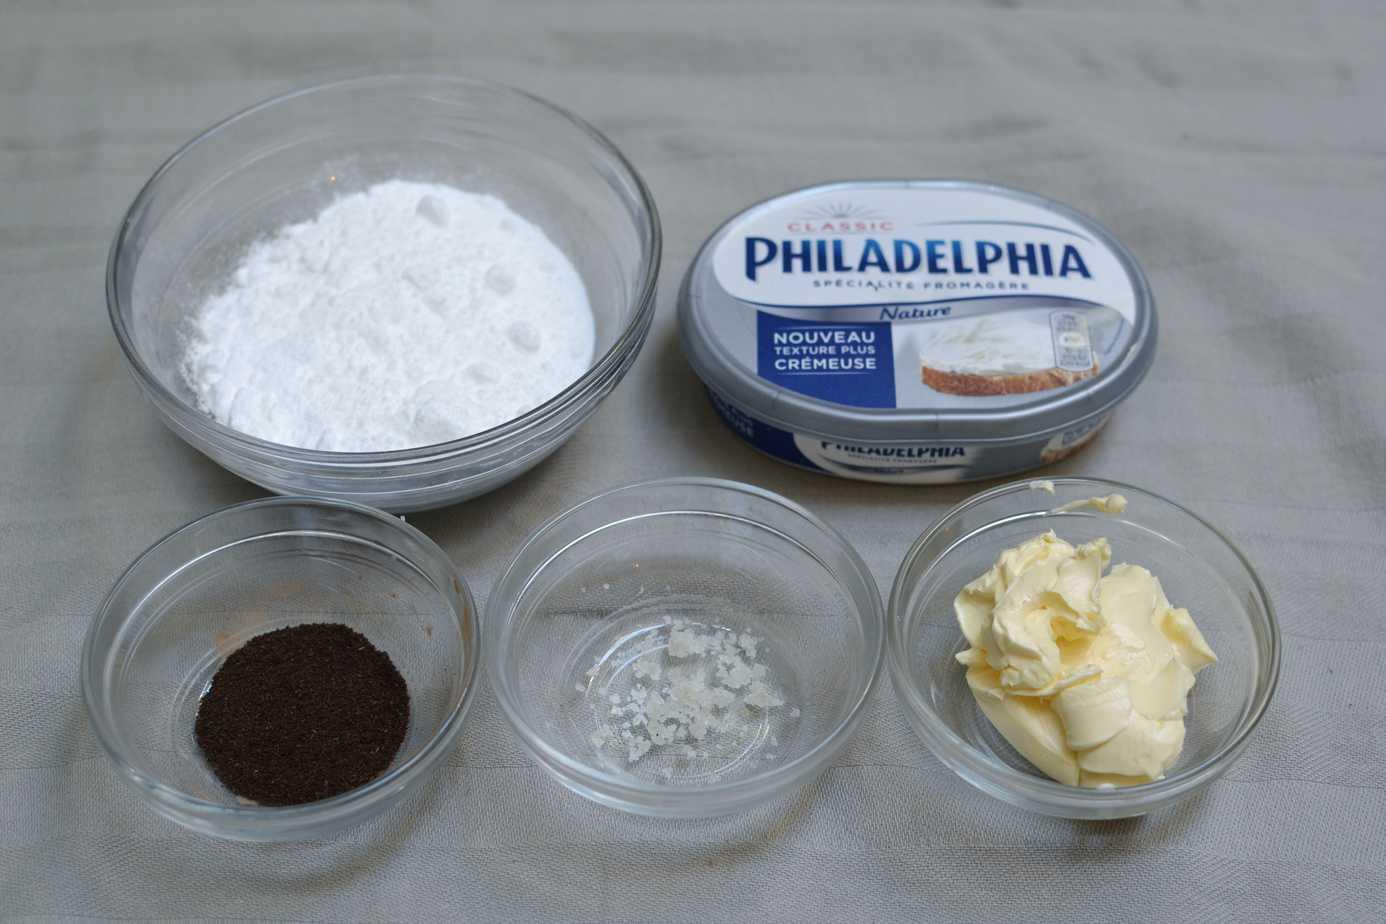 cinnabon rolls cream ingredients - maninio.com #cinnabonrolls #cinnamontreats